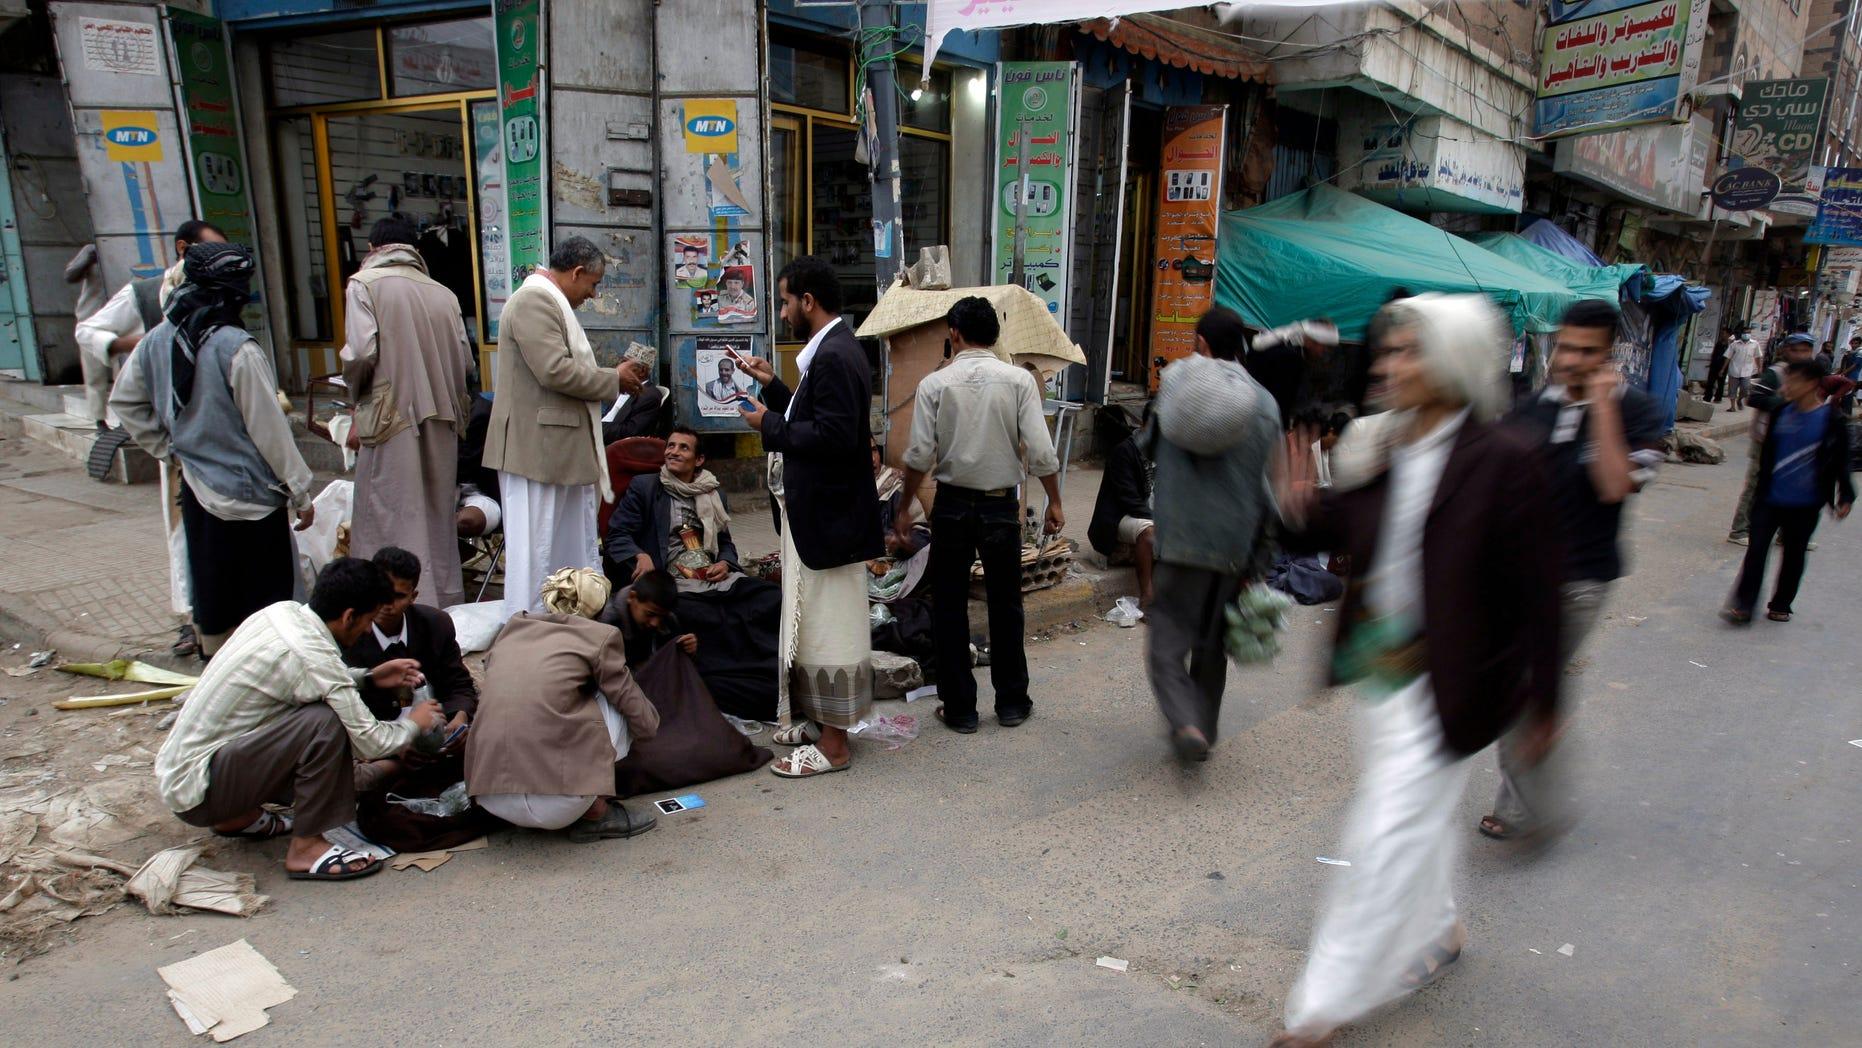 August 29: Yemenis walk past vendors selling Qat next to the site of anti-government protestors demanding the resignation of Yemen's President Ali Abdullah Saleh, in Sanaa, Yemen.